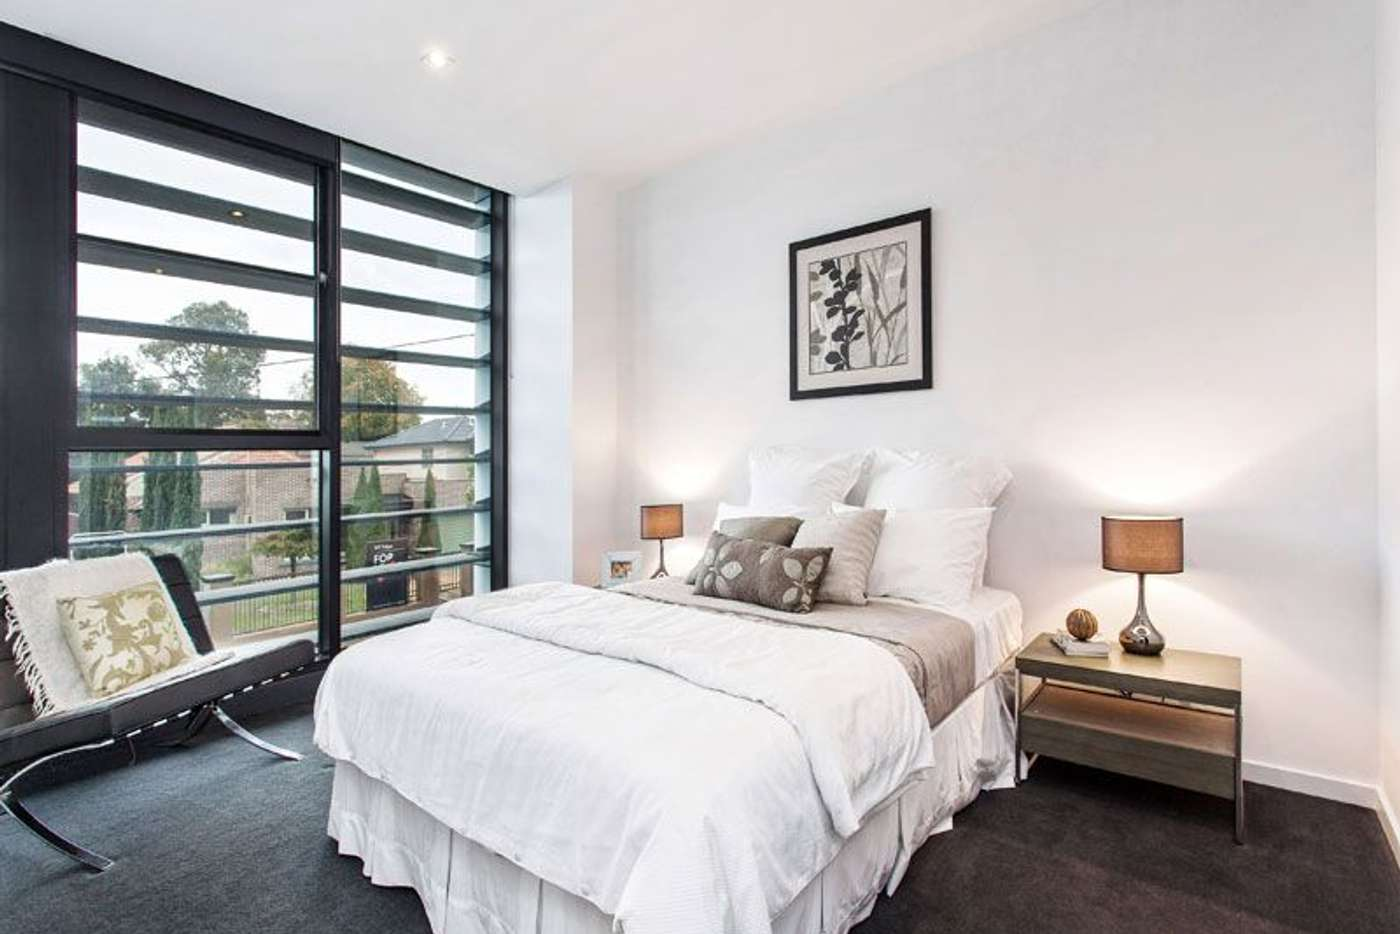 Main view of Homely apartment listing, 128/75 Graham Road, Highett VIC 3190